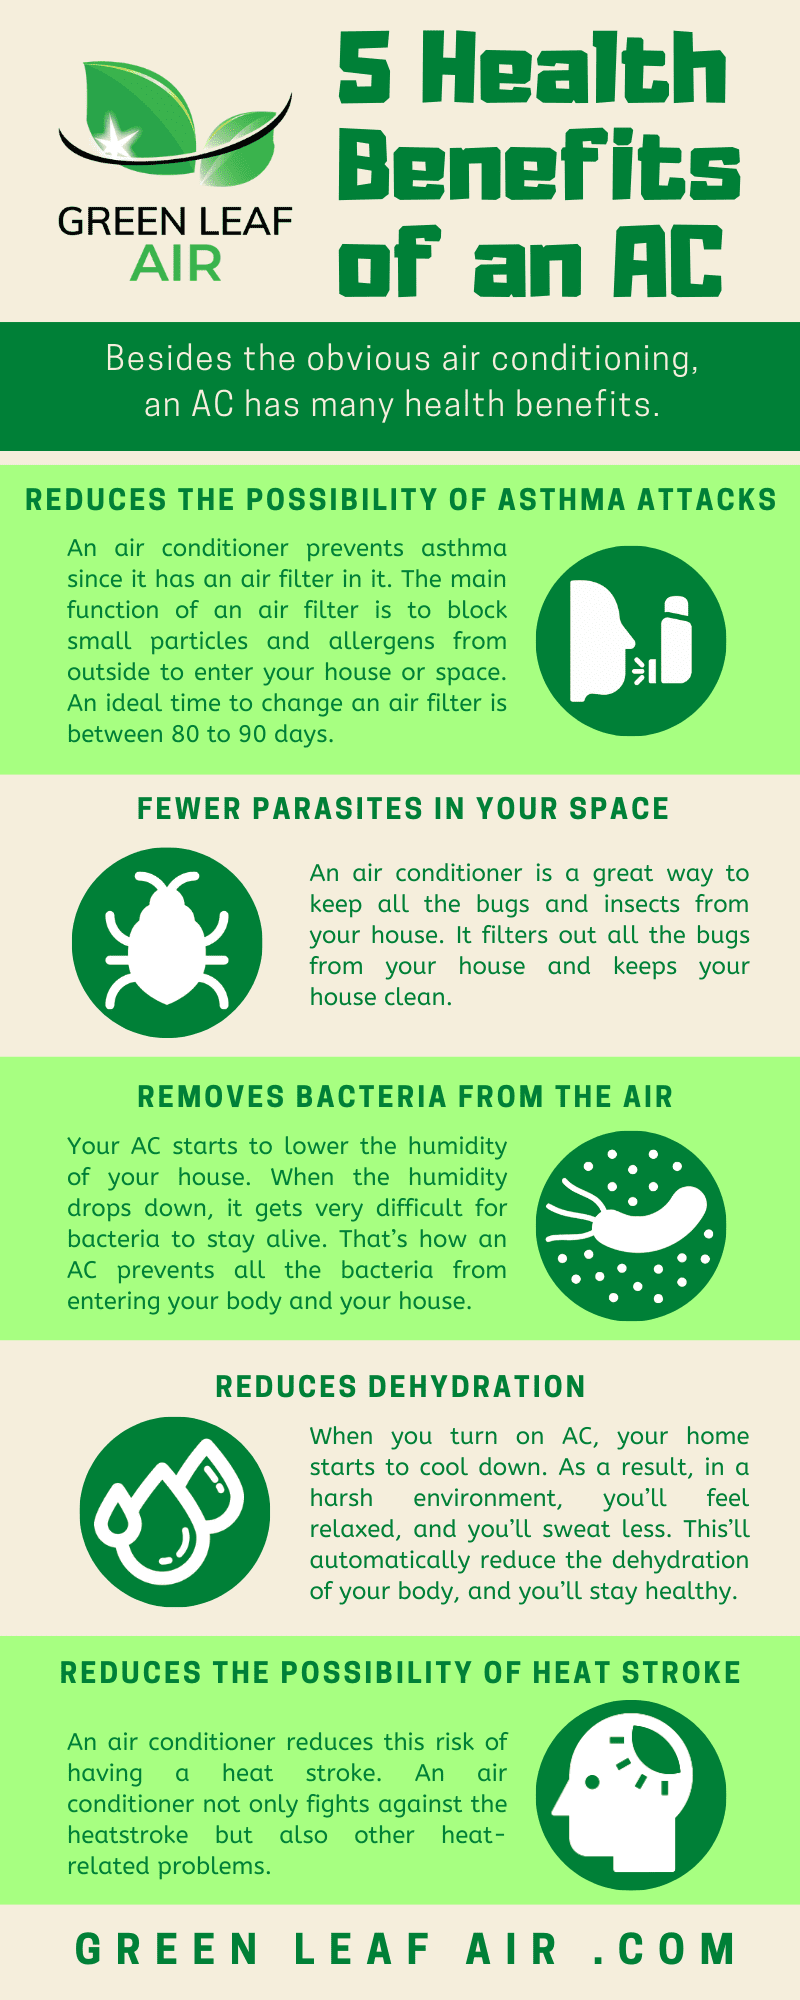 5 Health Benefits of an AC